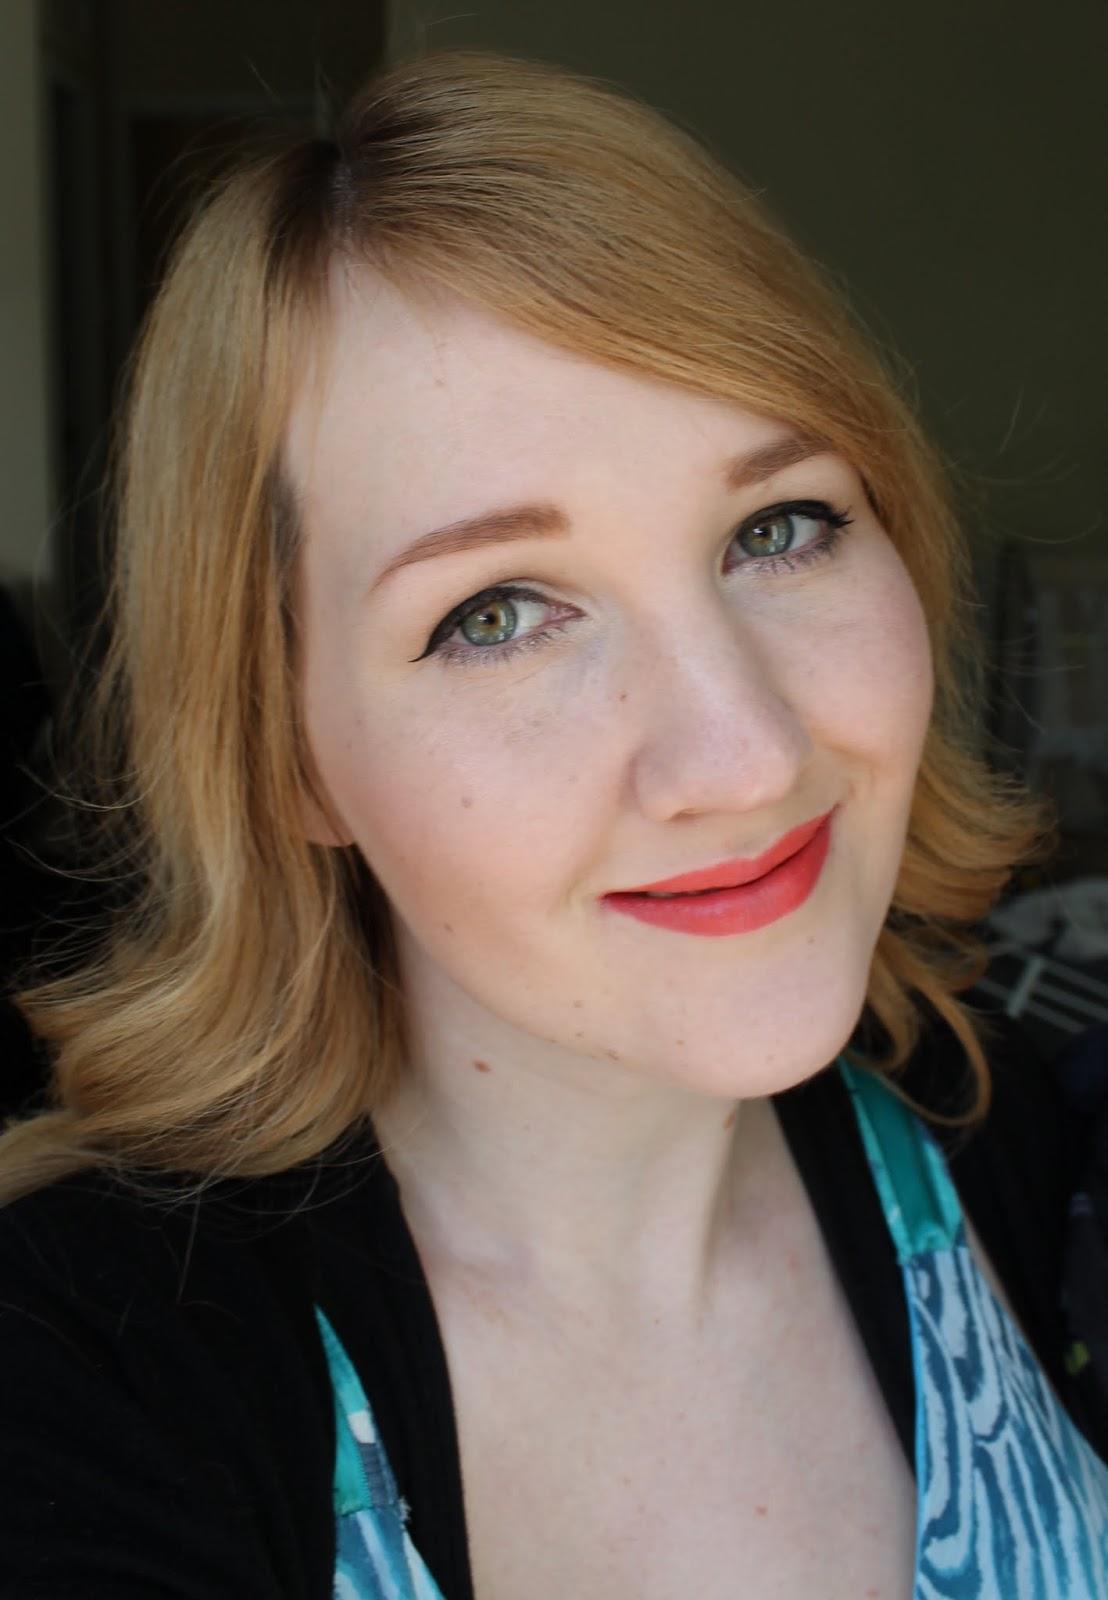 Karen Murrell Lipstick - Coral Dawn Swatches & Review